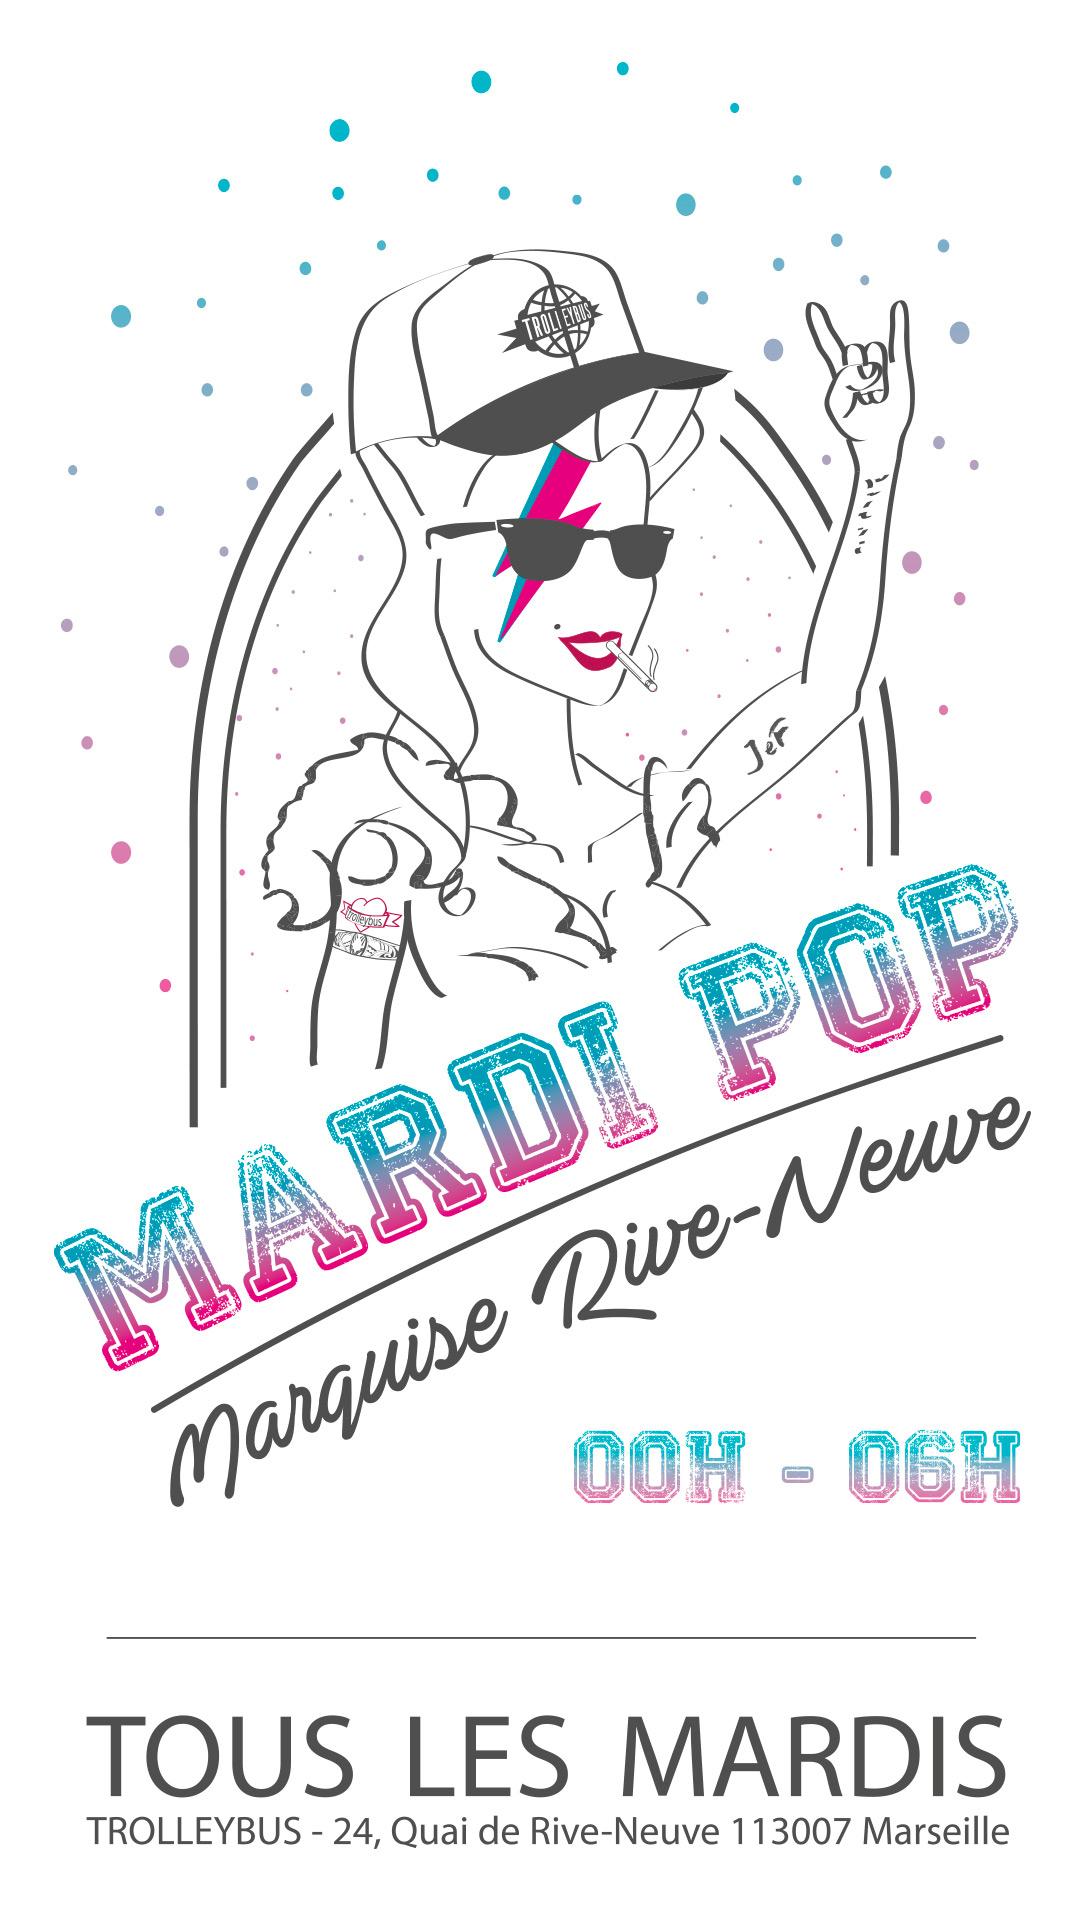 Marquise rive neuve, mardi, ouverture, marseille, club